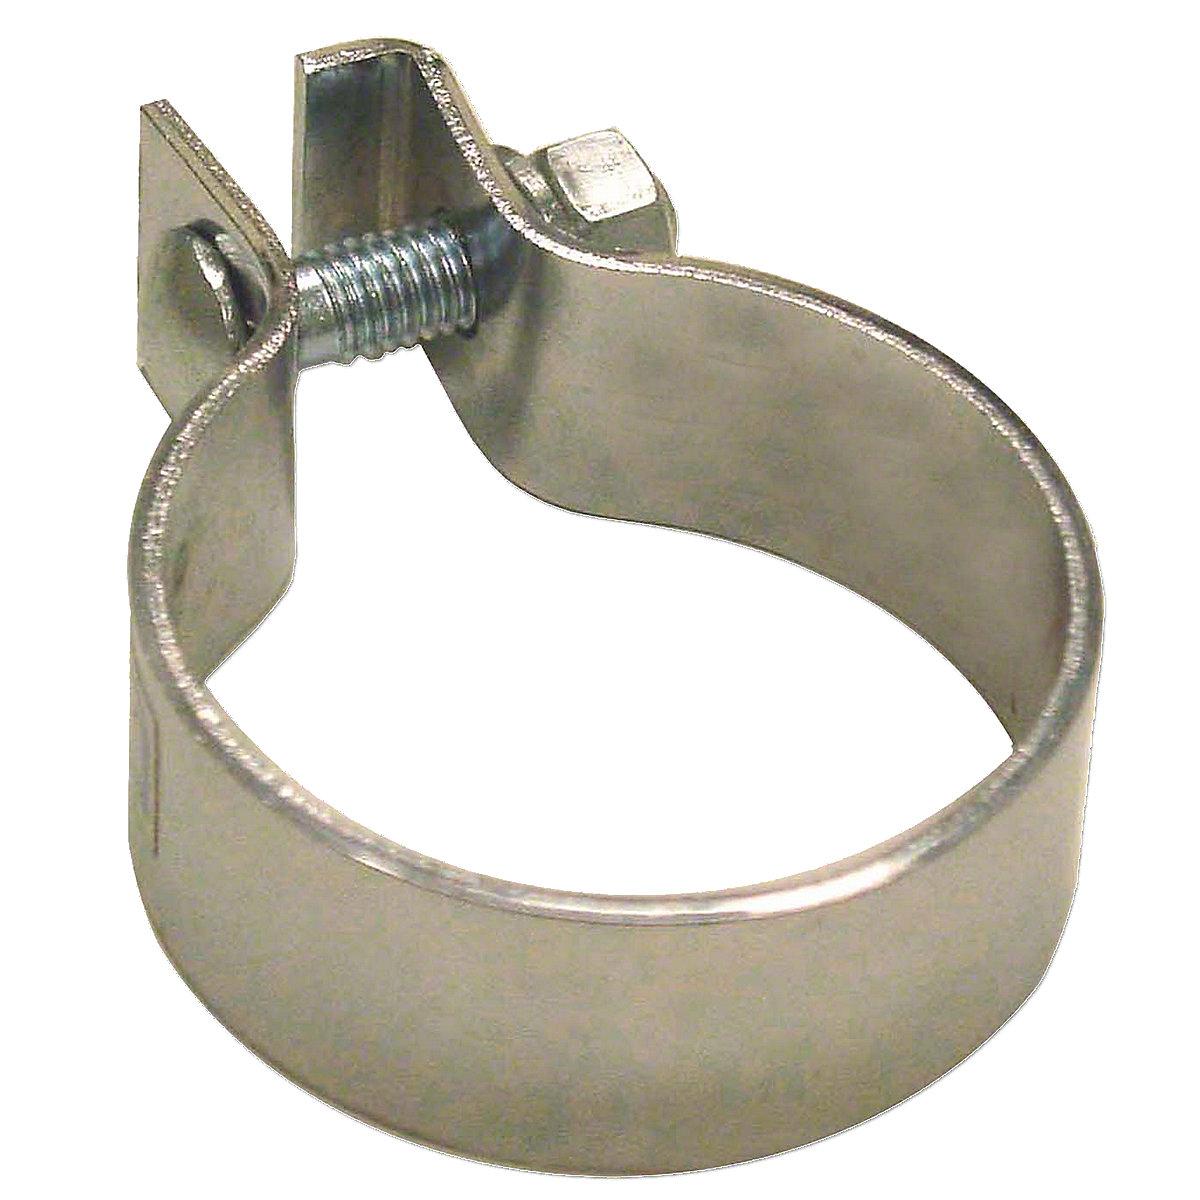 ABC351Chrome Muffler Clamp